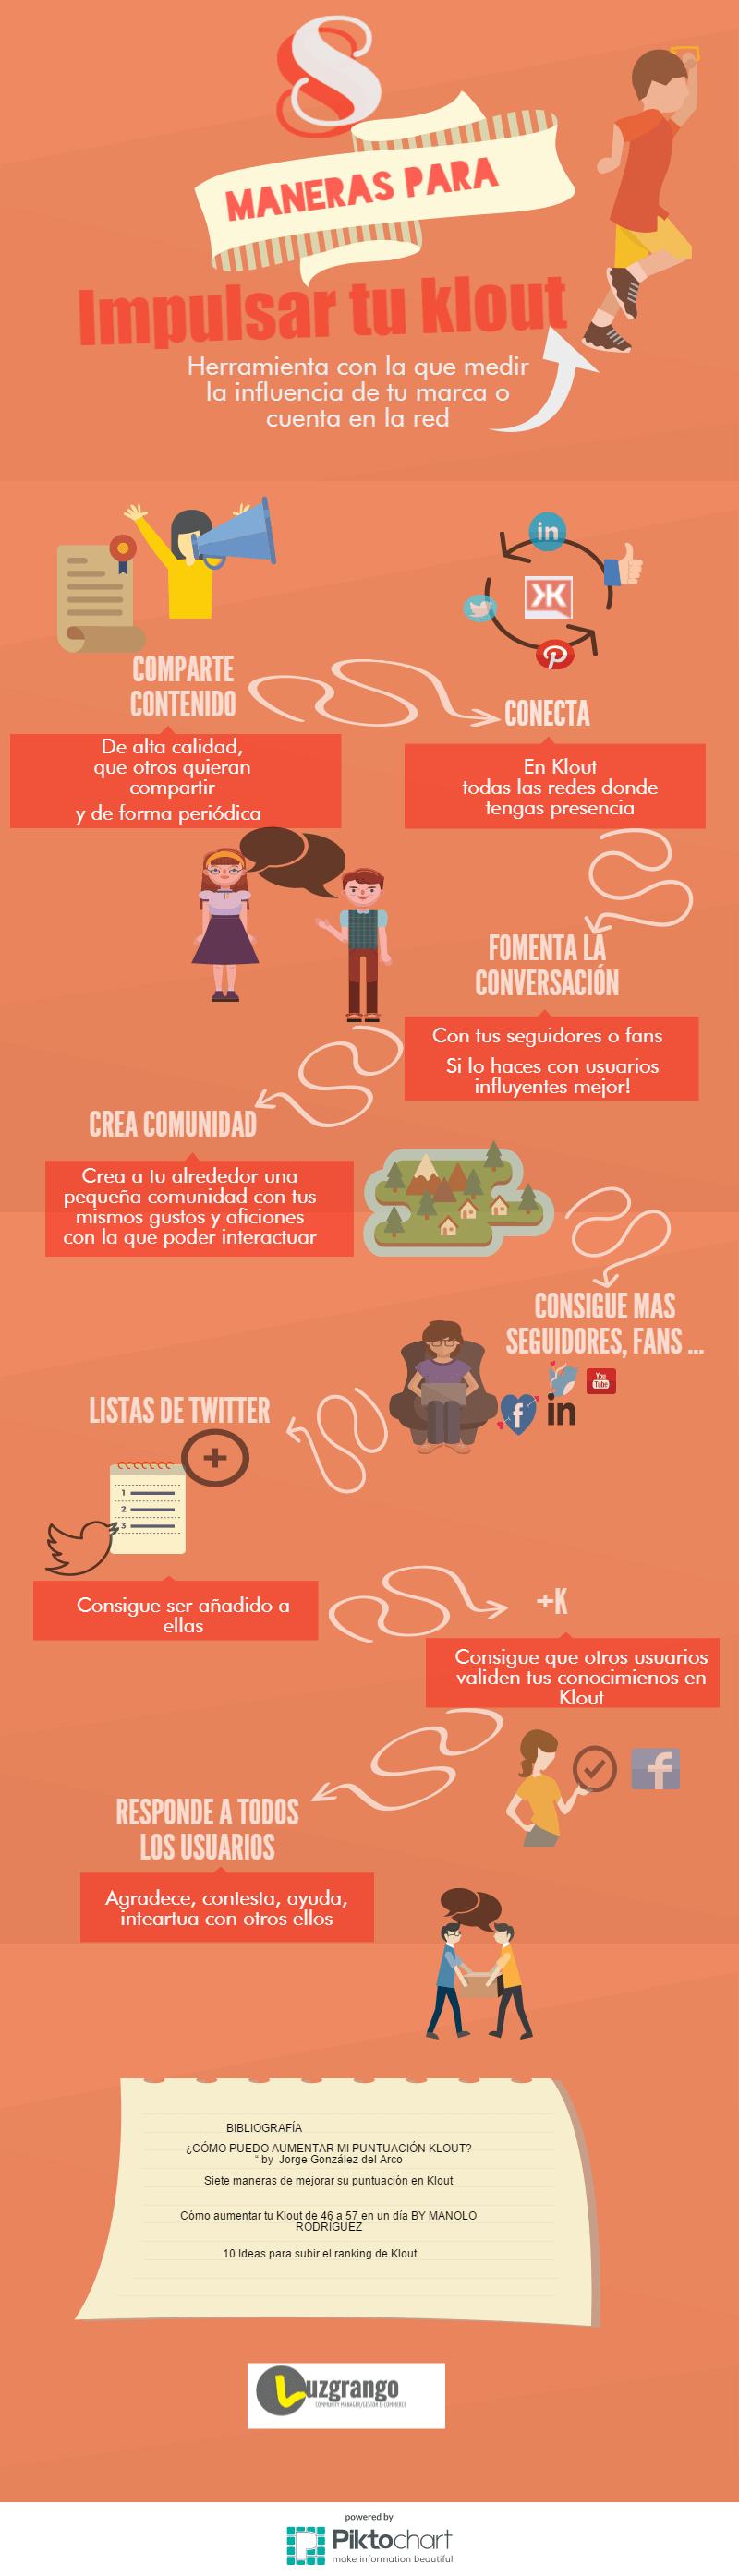 8 maneras de potenciar tu Klout